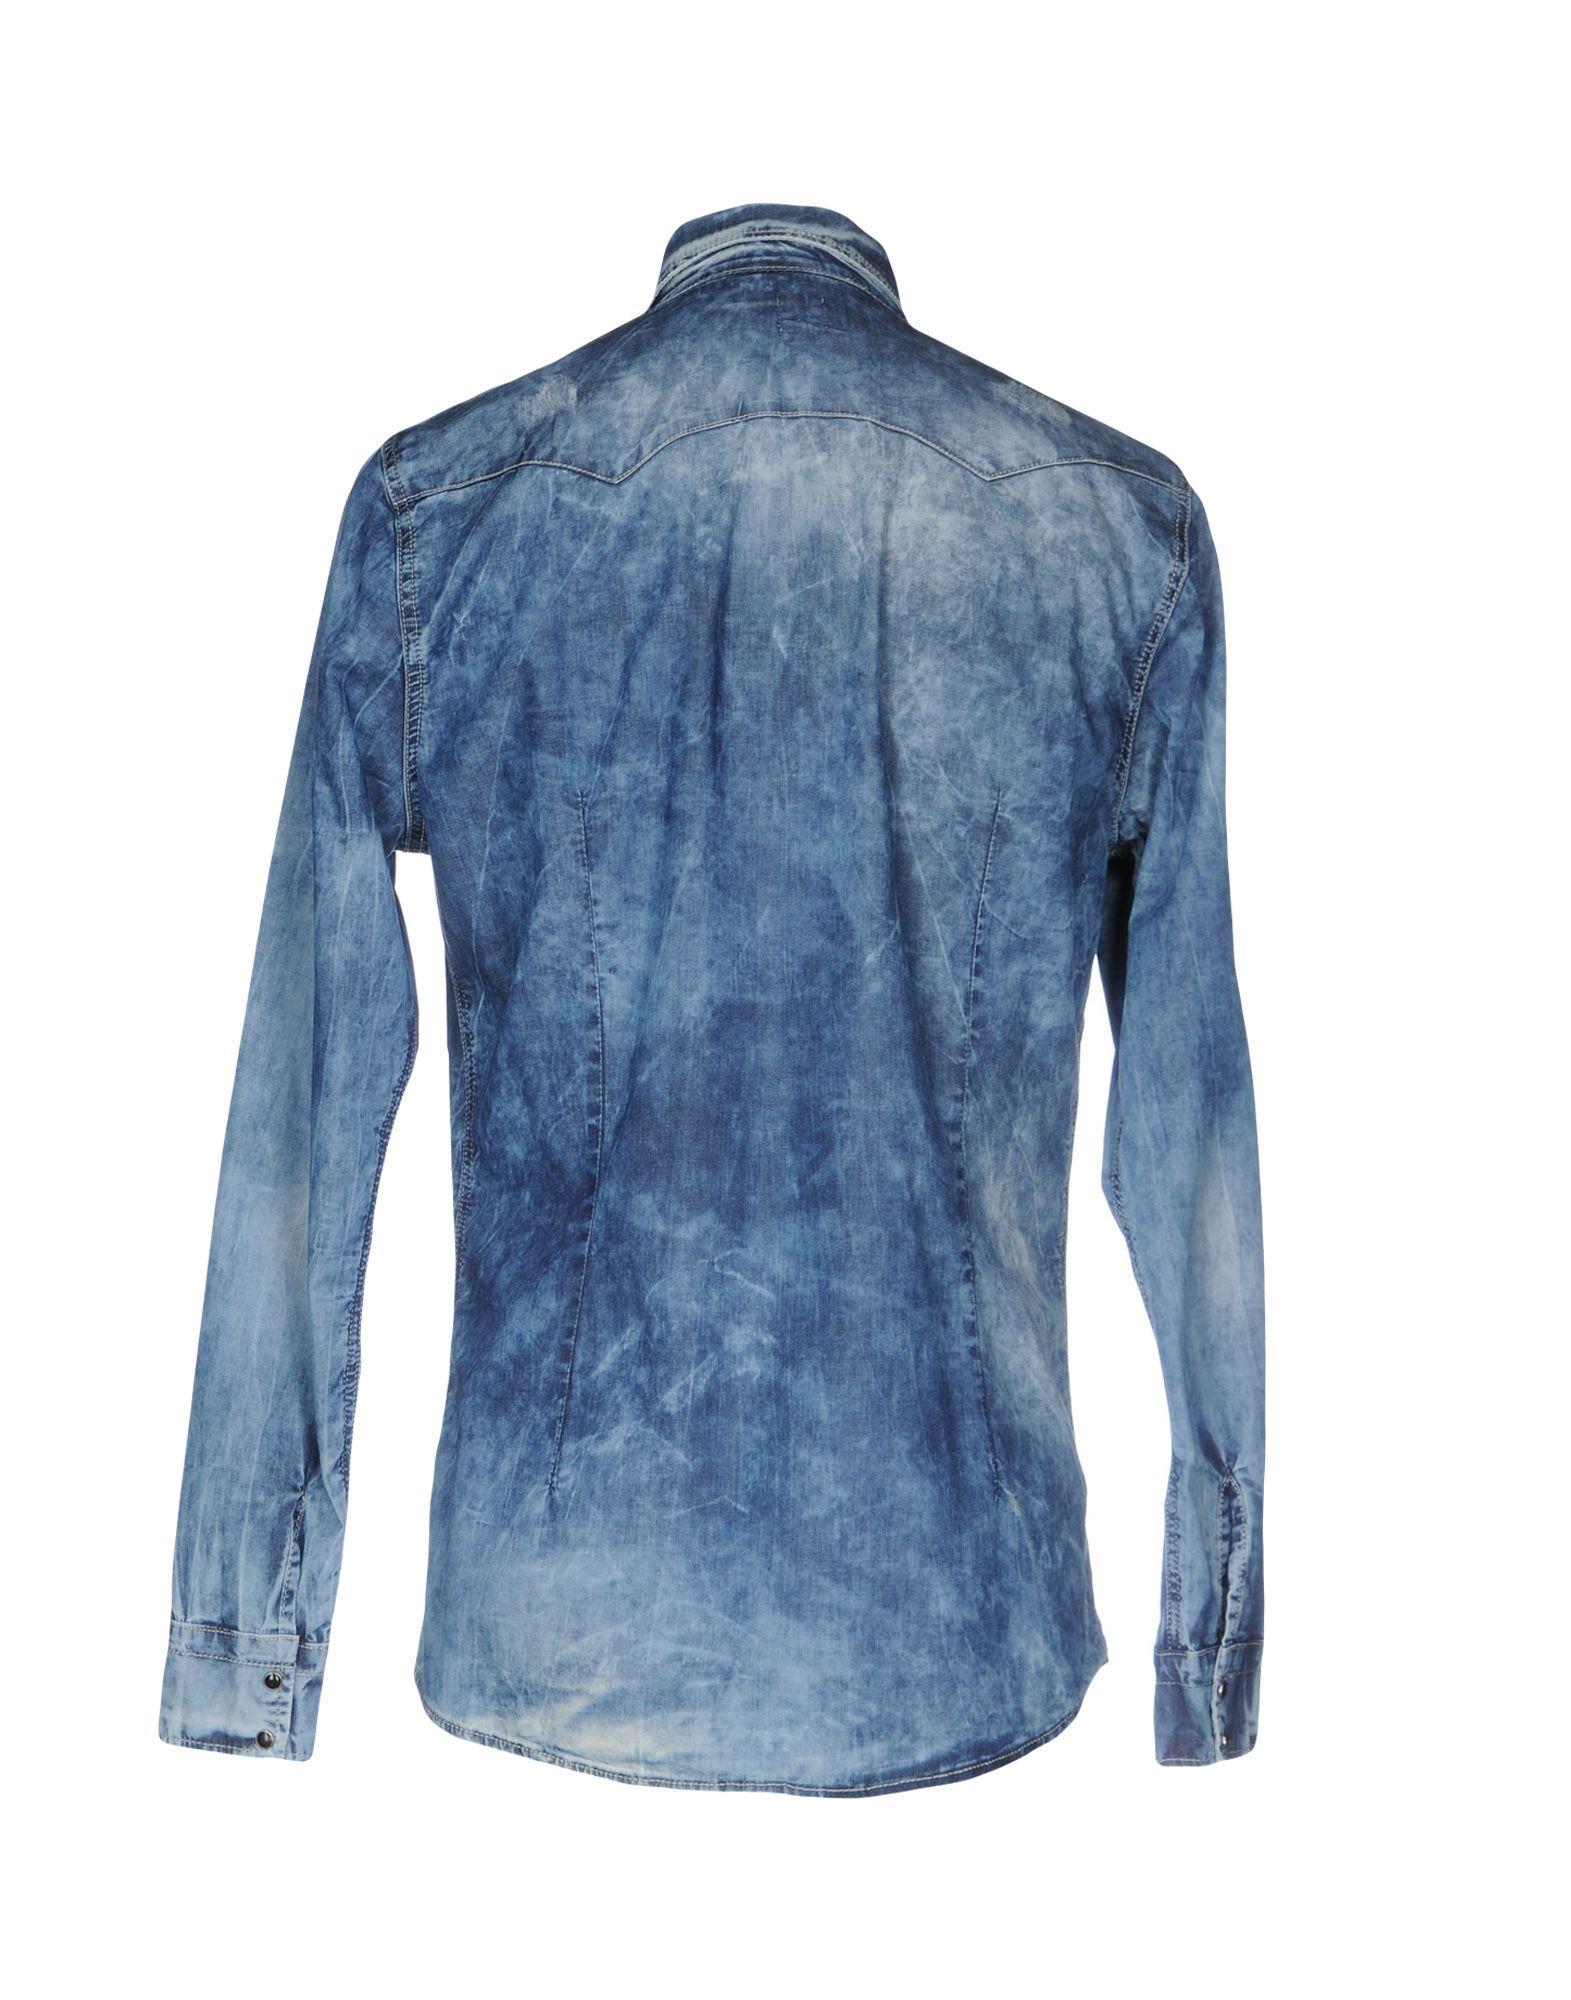 Camicia Jeans 42619840KI Daniele Alessandrini Uomo - 42619840KI Jeans 10f7e6